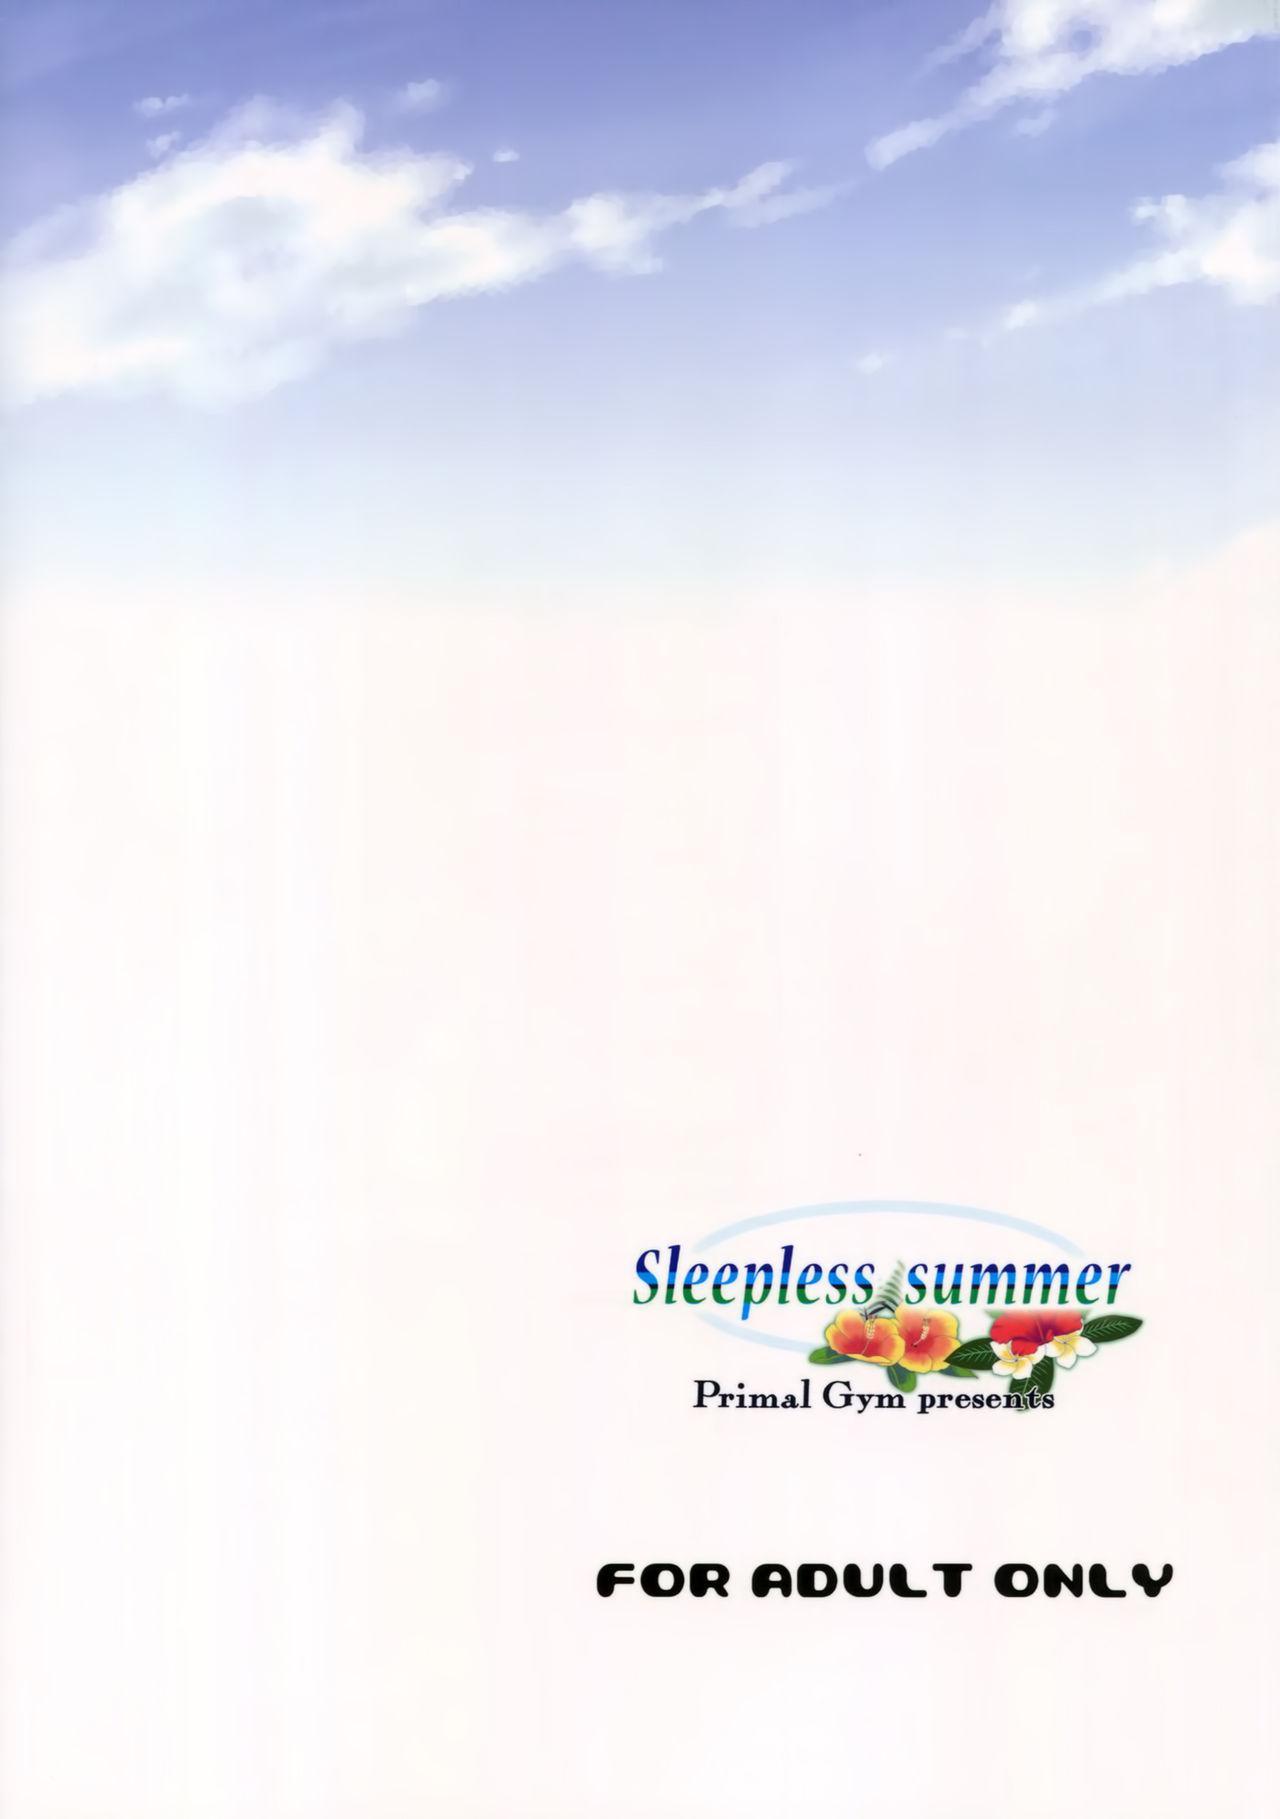 Sleepless summer 21